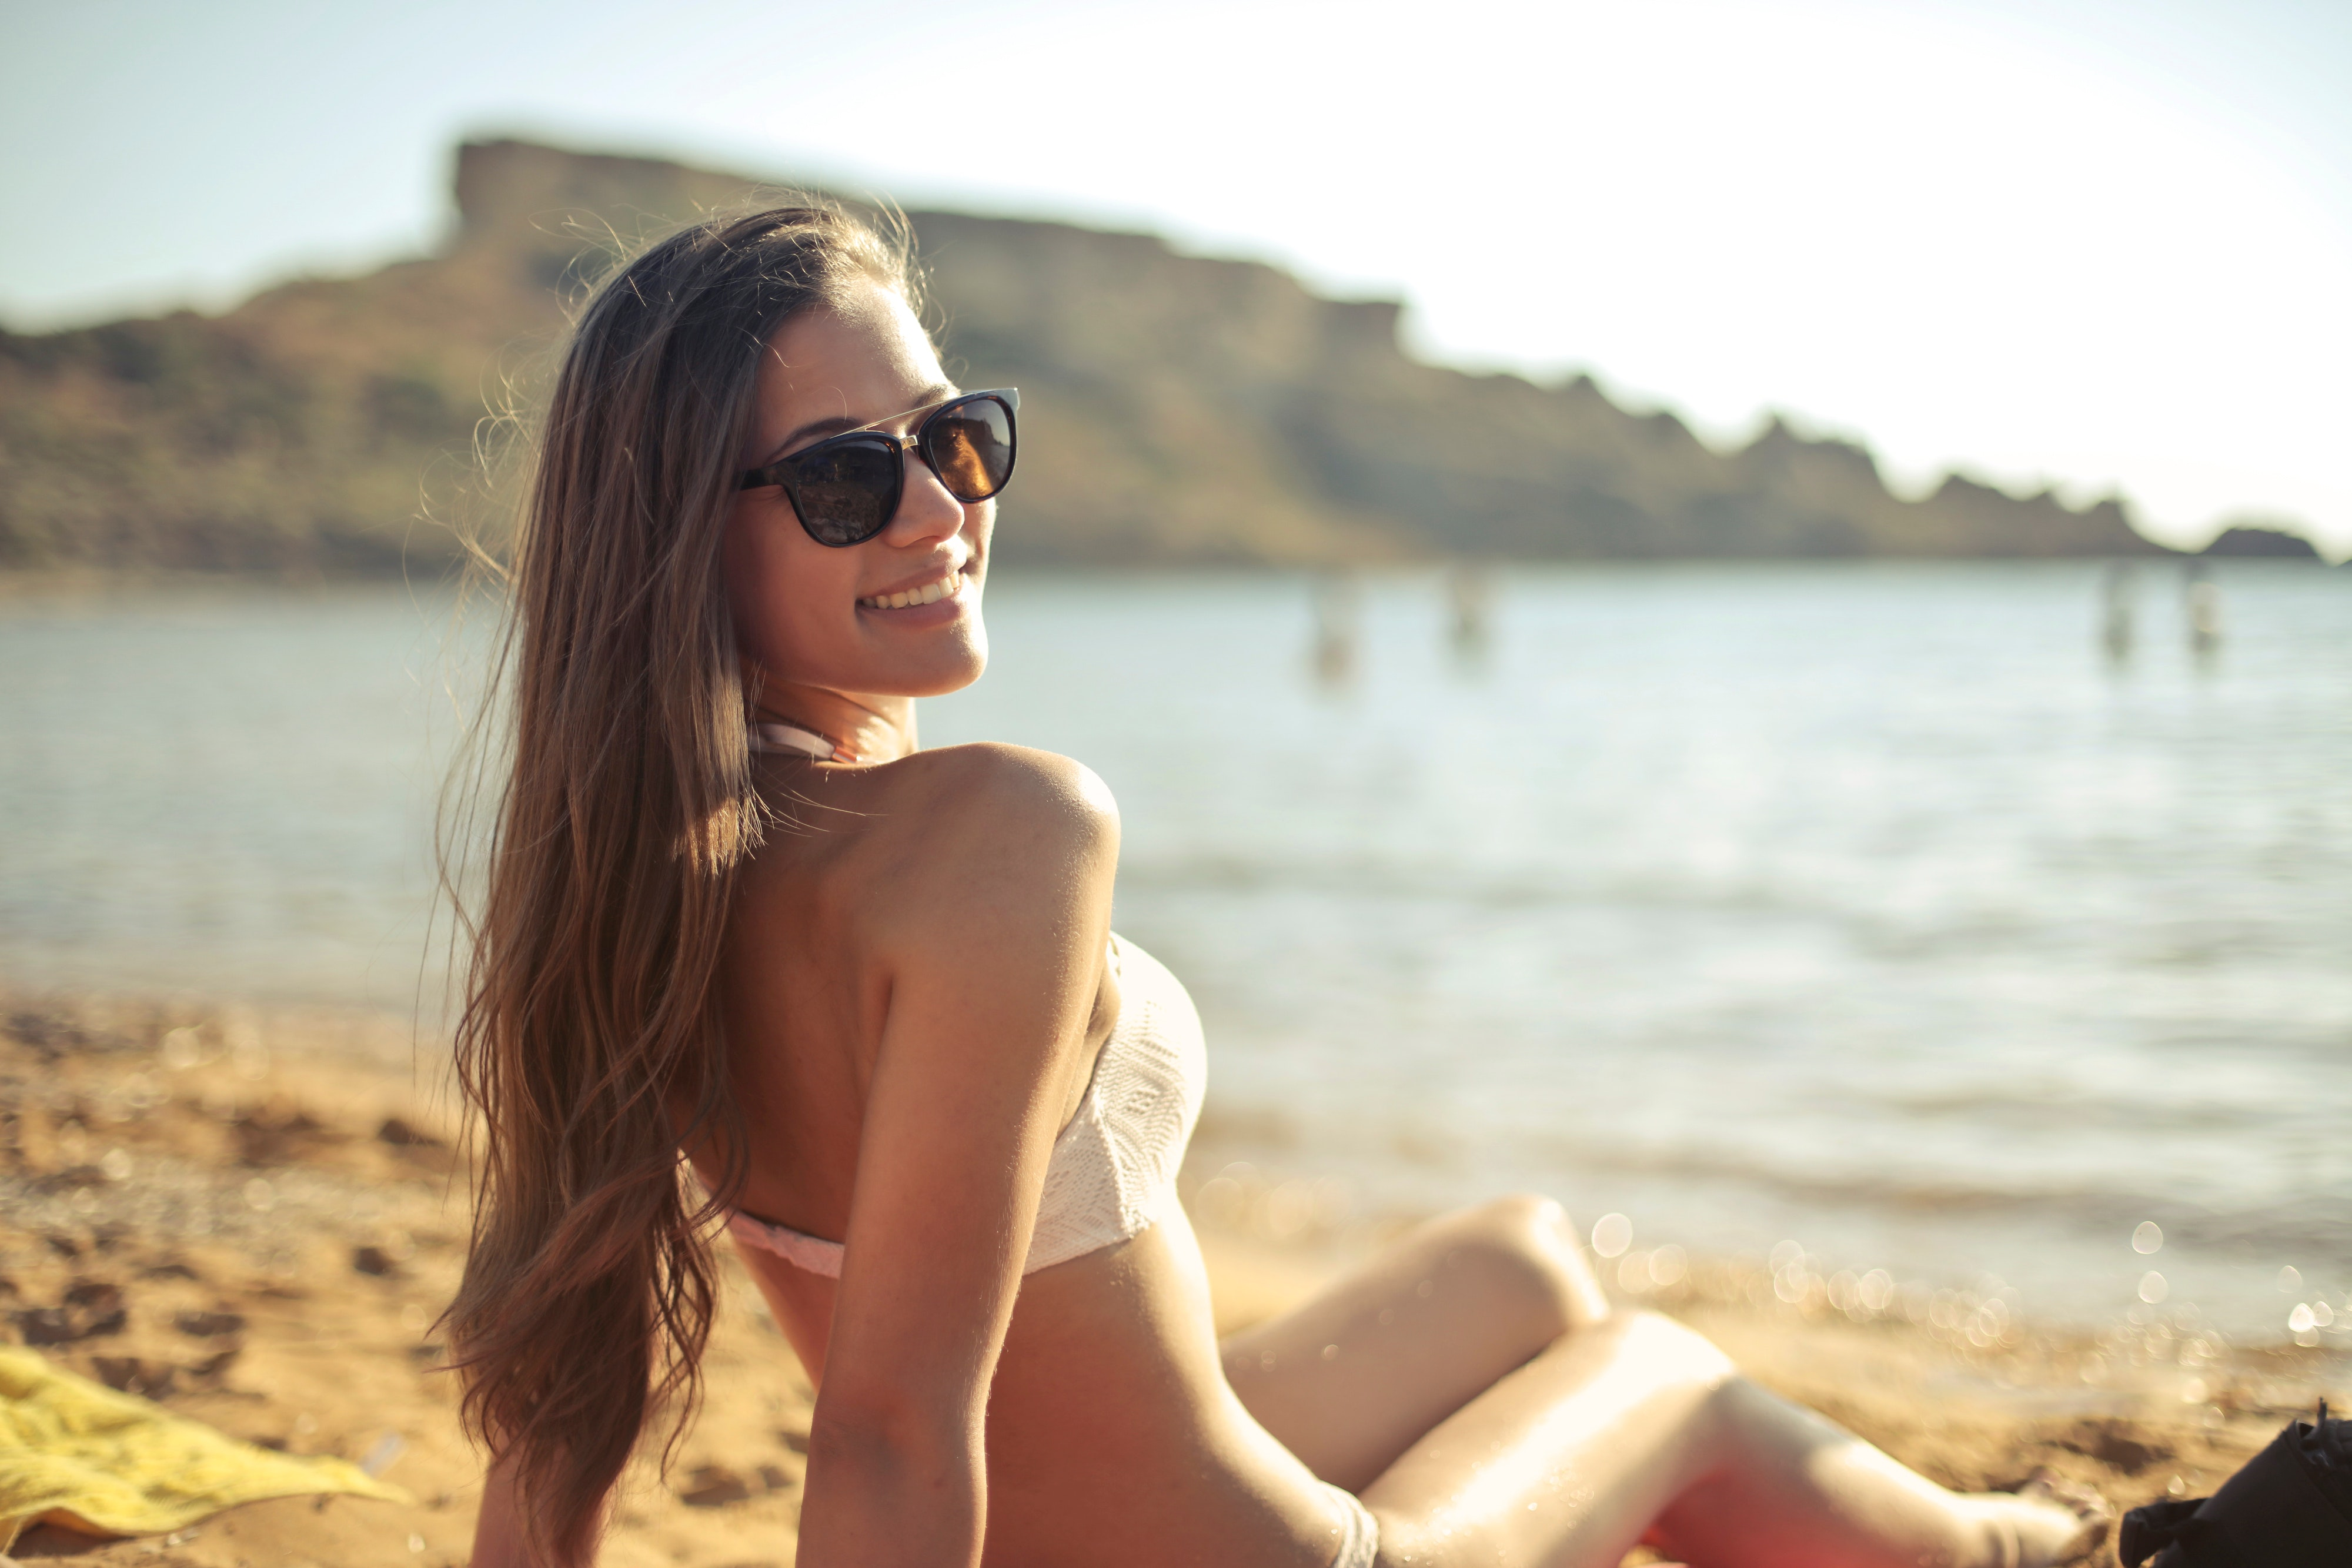 Woman in white bikini set sitting near seashore photo